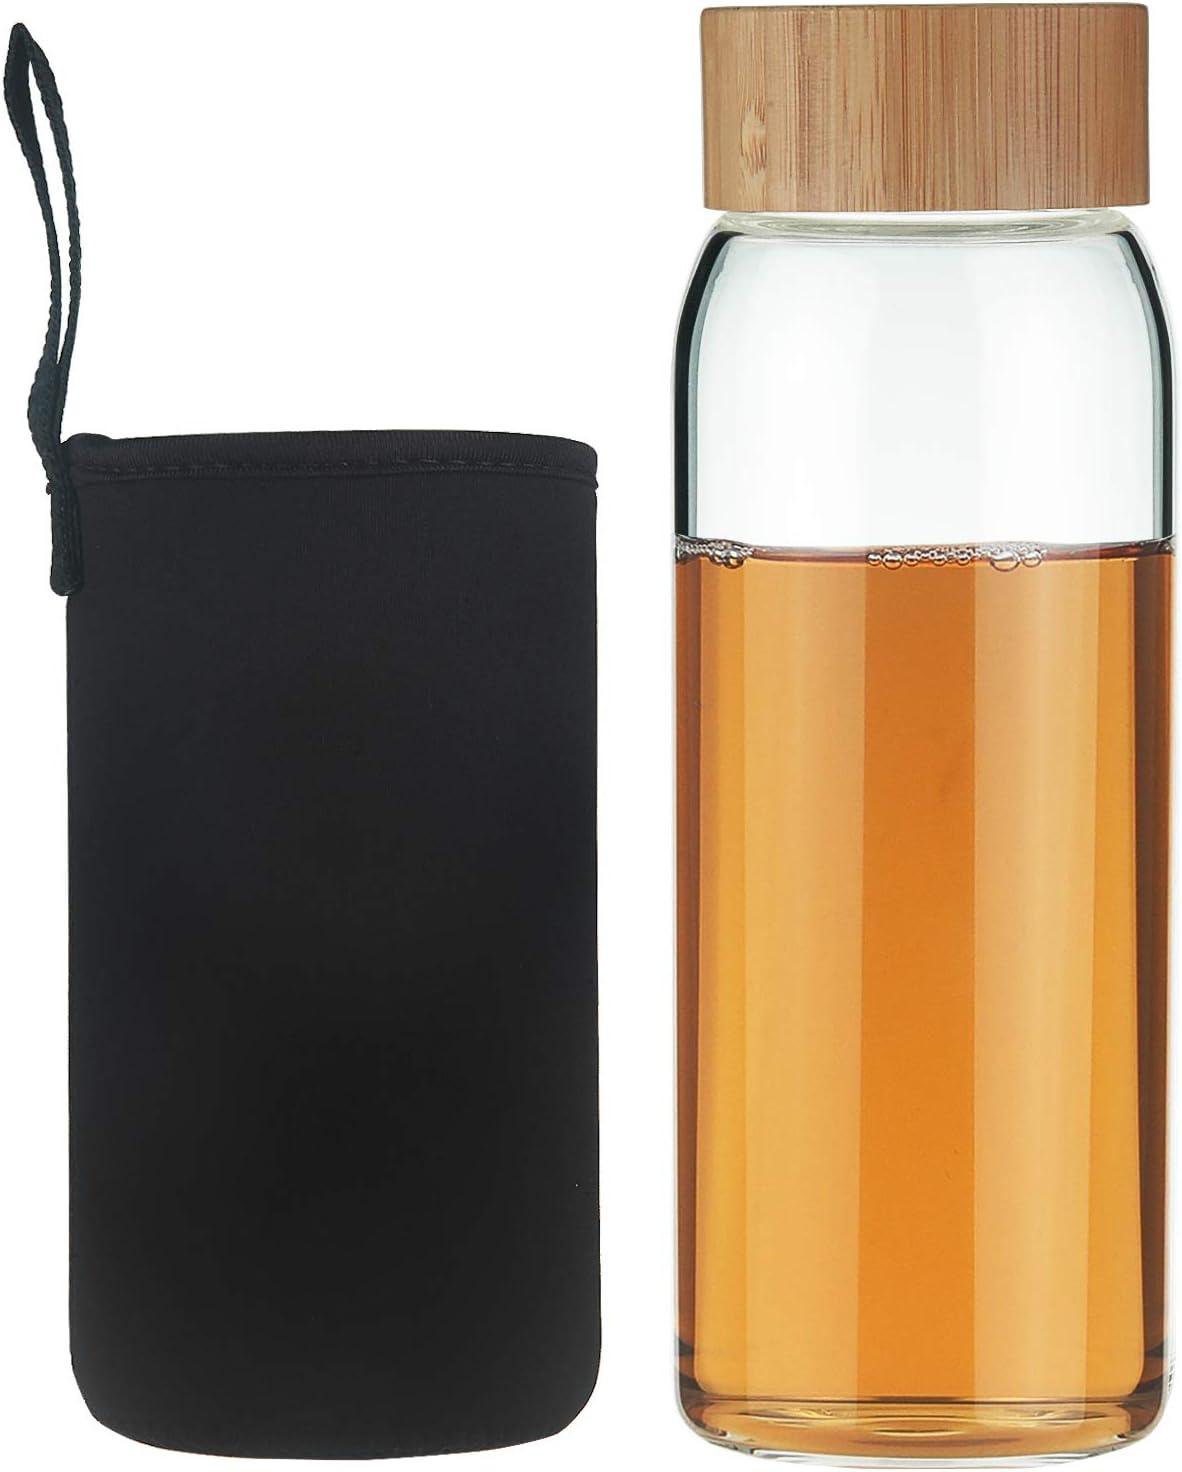 Life4u Botella de Agua de Cristal de Borosilicato de con Funda de Neopreno Sin BPA 750 ml